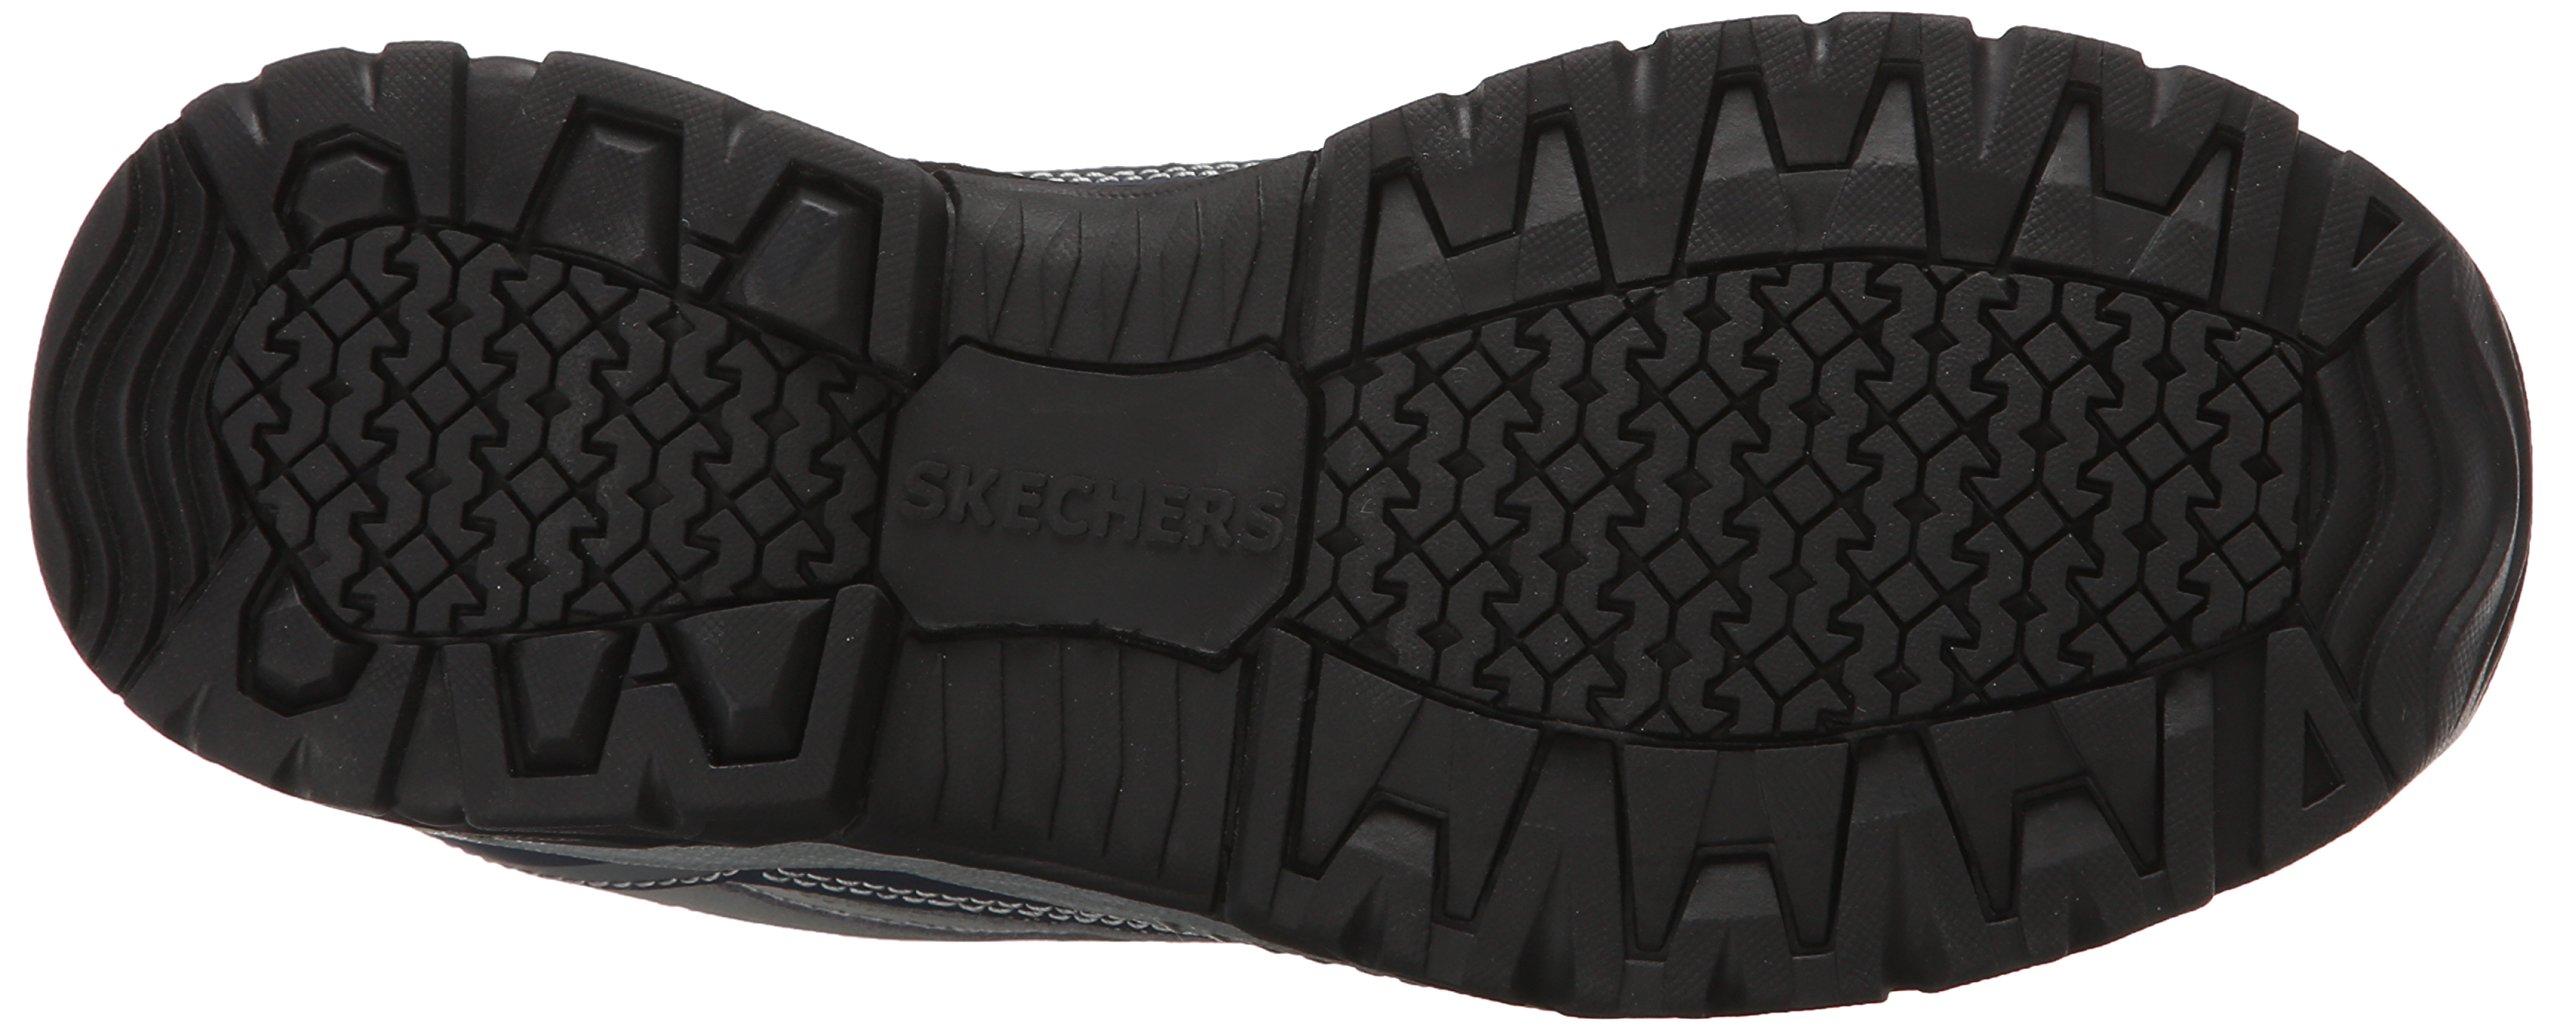 Skechers for Work Women's Doyline Hiker Boot, Gray Pink, 9 M US by Skechers (Image #3)